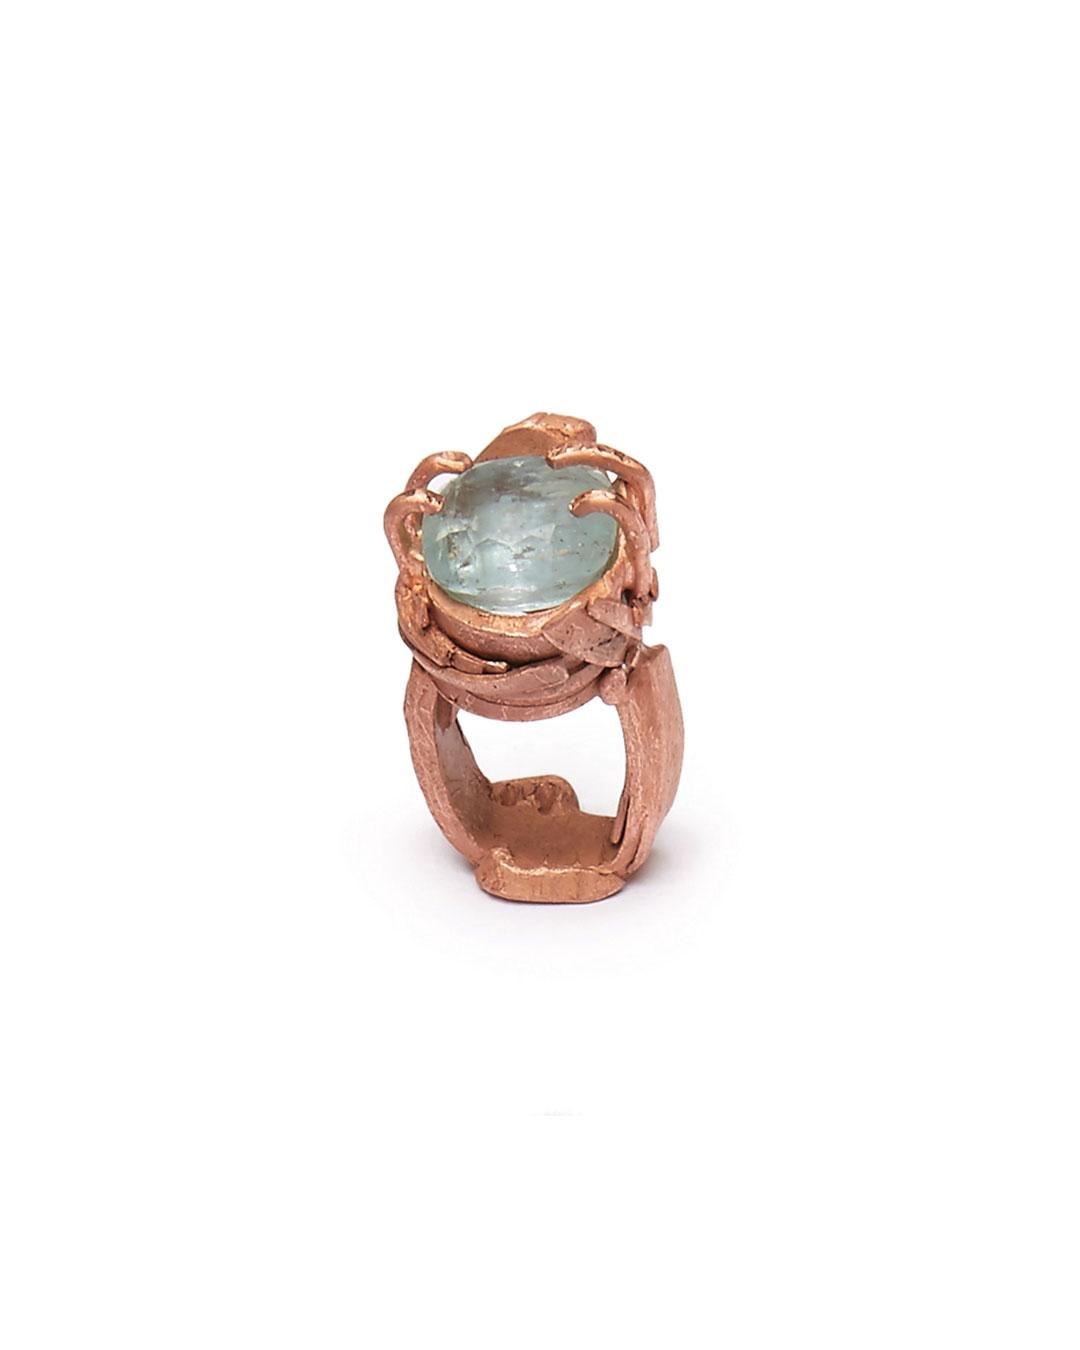 Iris Bodemer, Notizen (Notes), 2016, ring; bronze, aquamarine, 40 x 25 x 25 mm, €1250